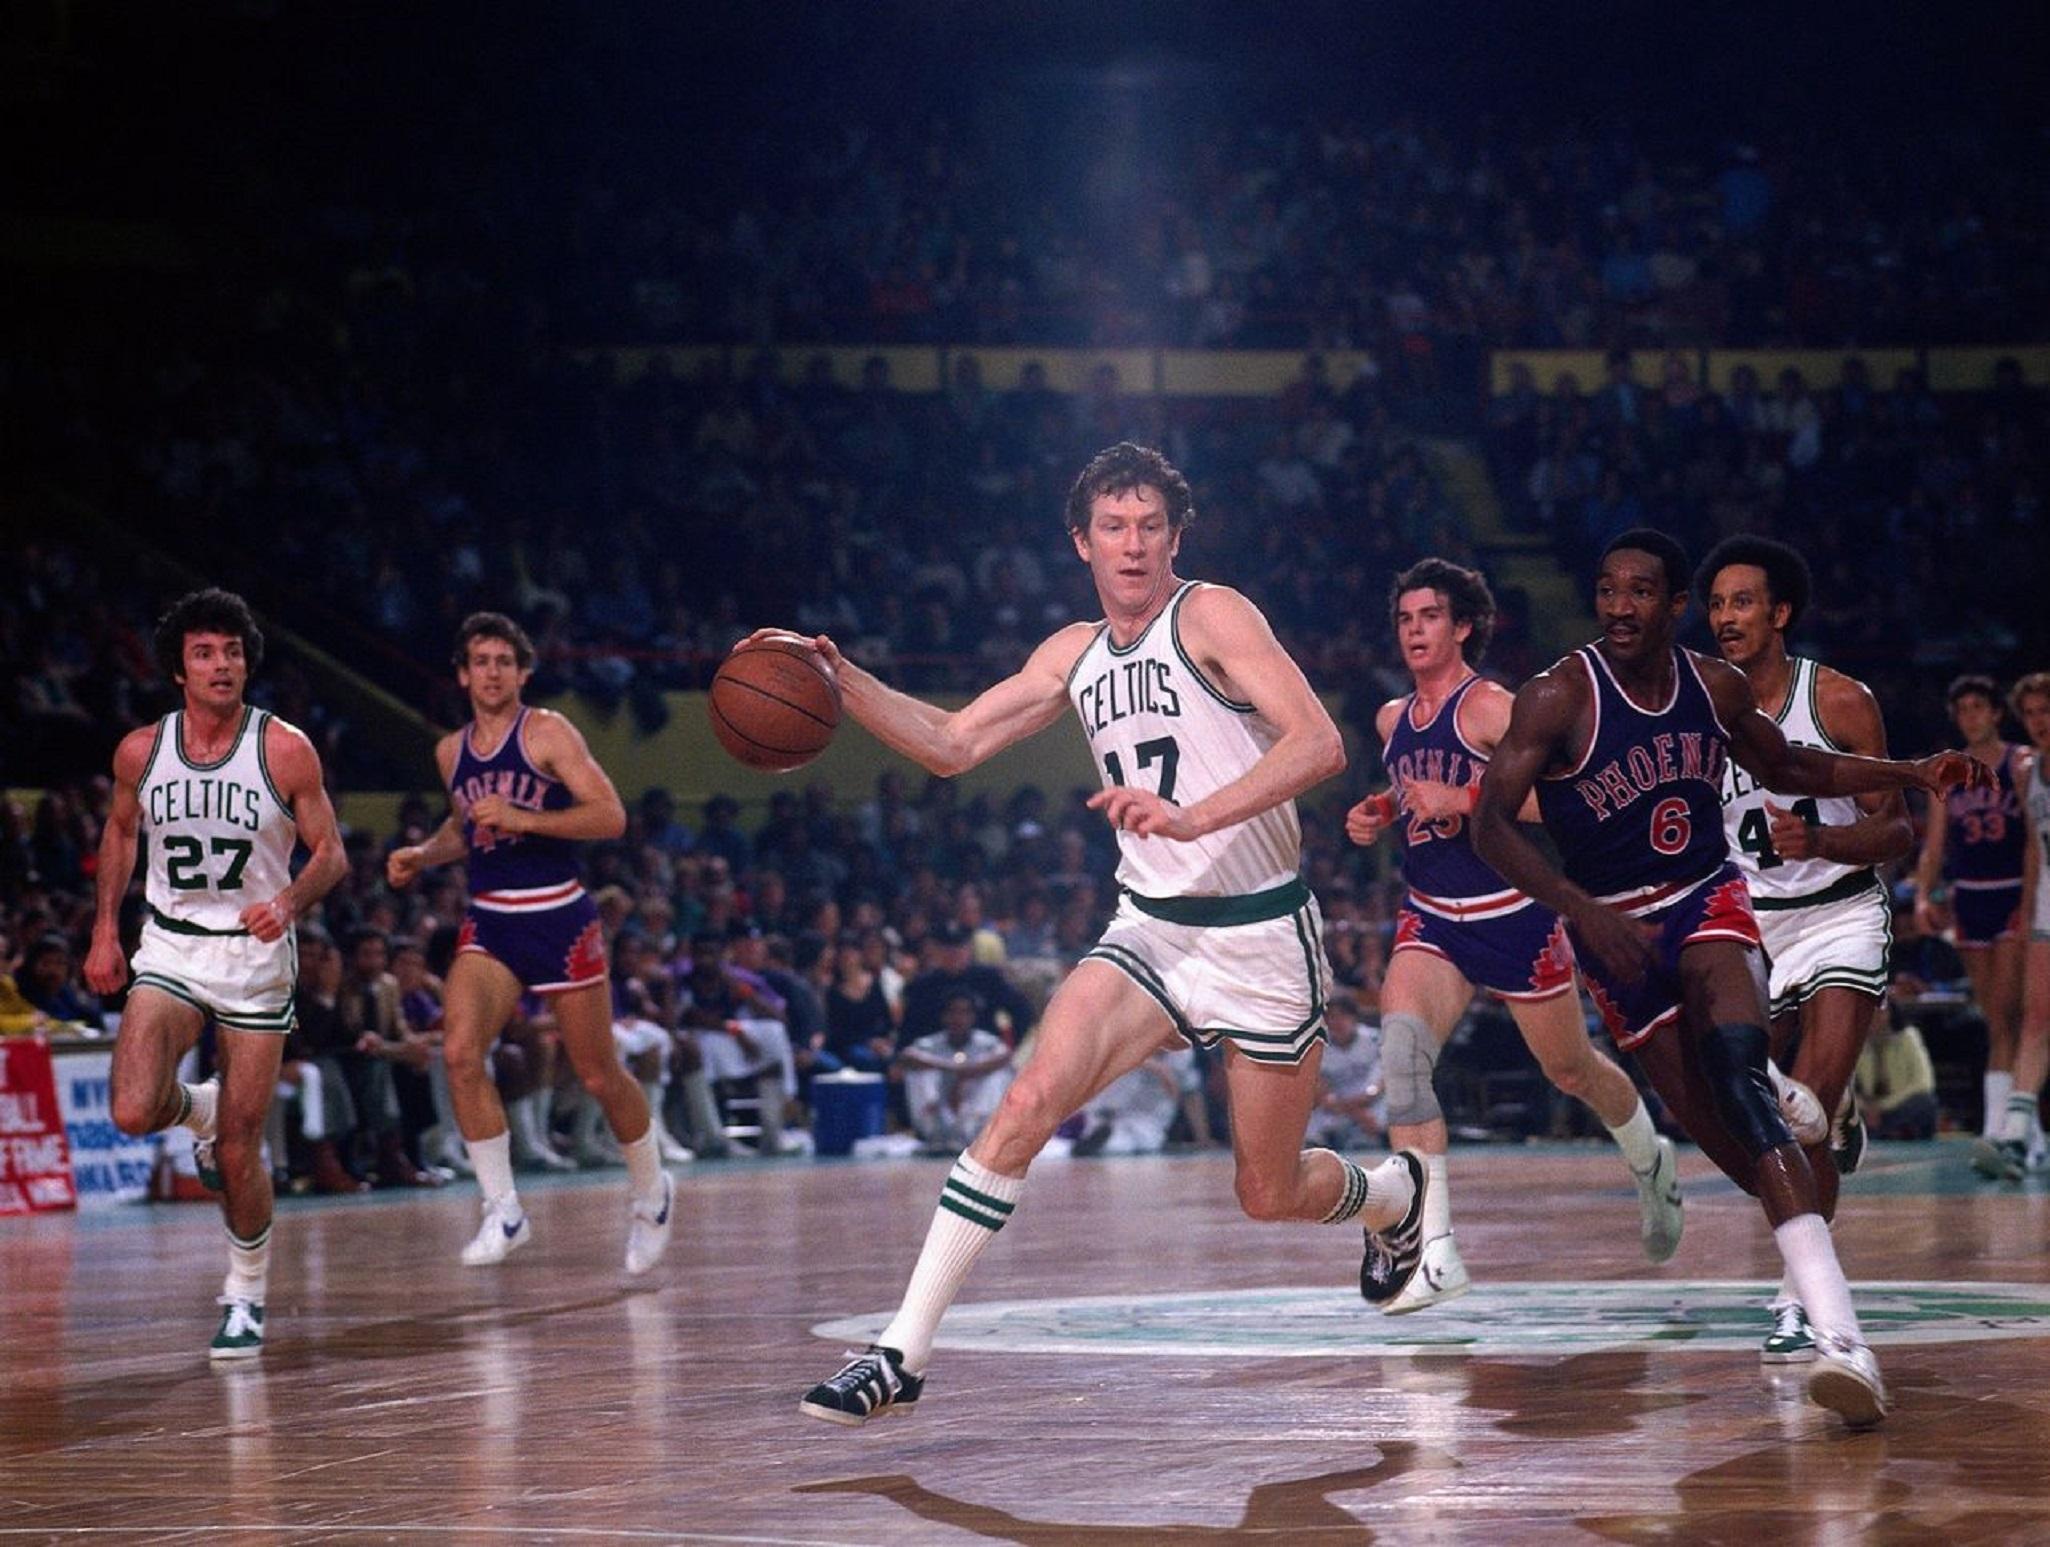 Episode #57 (6/9/16): 1976 NBA Finals Game 5